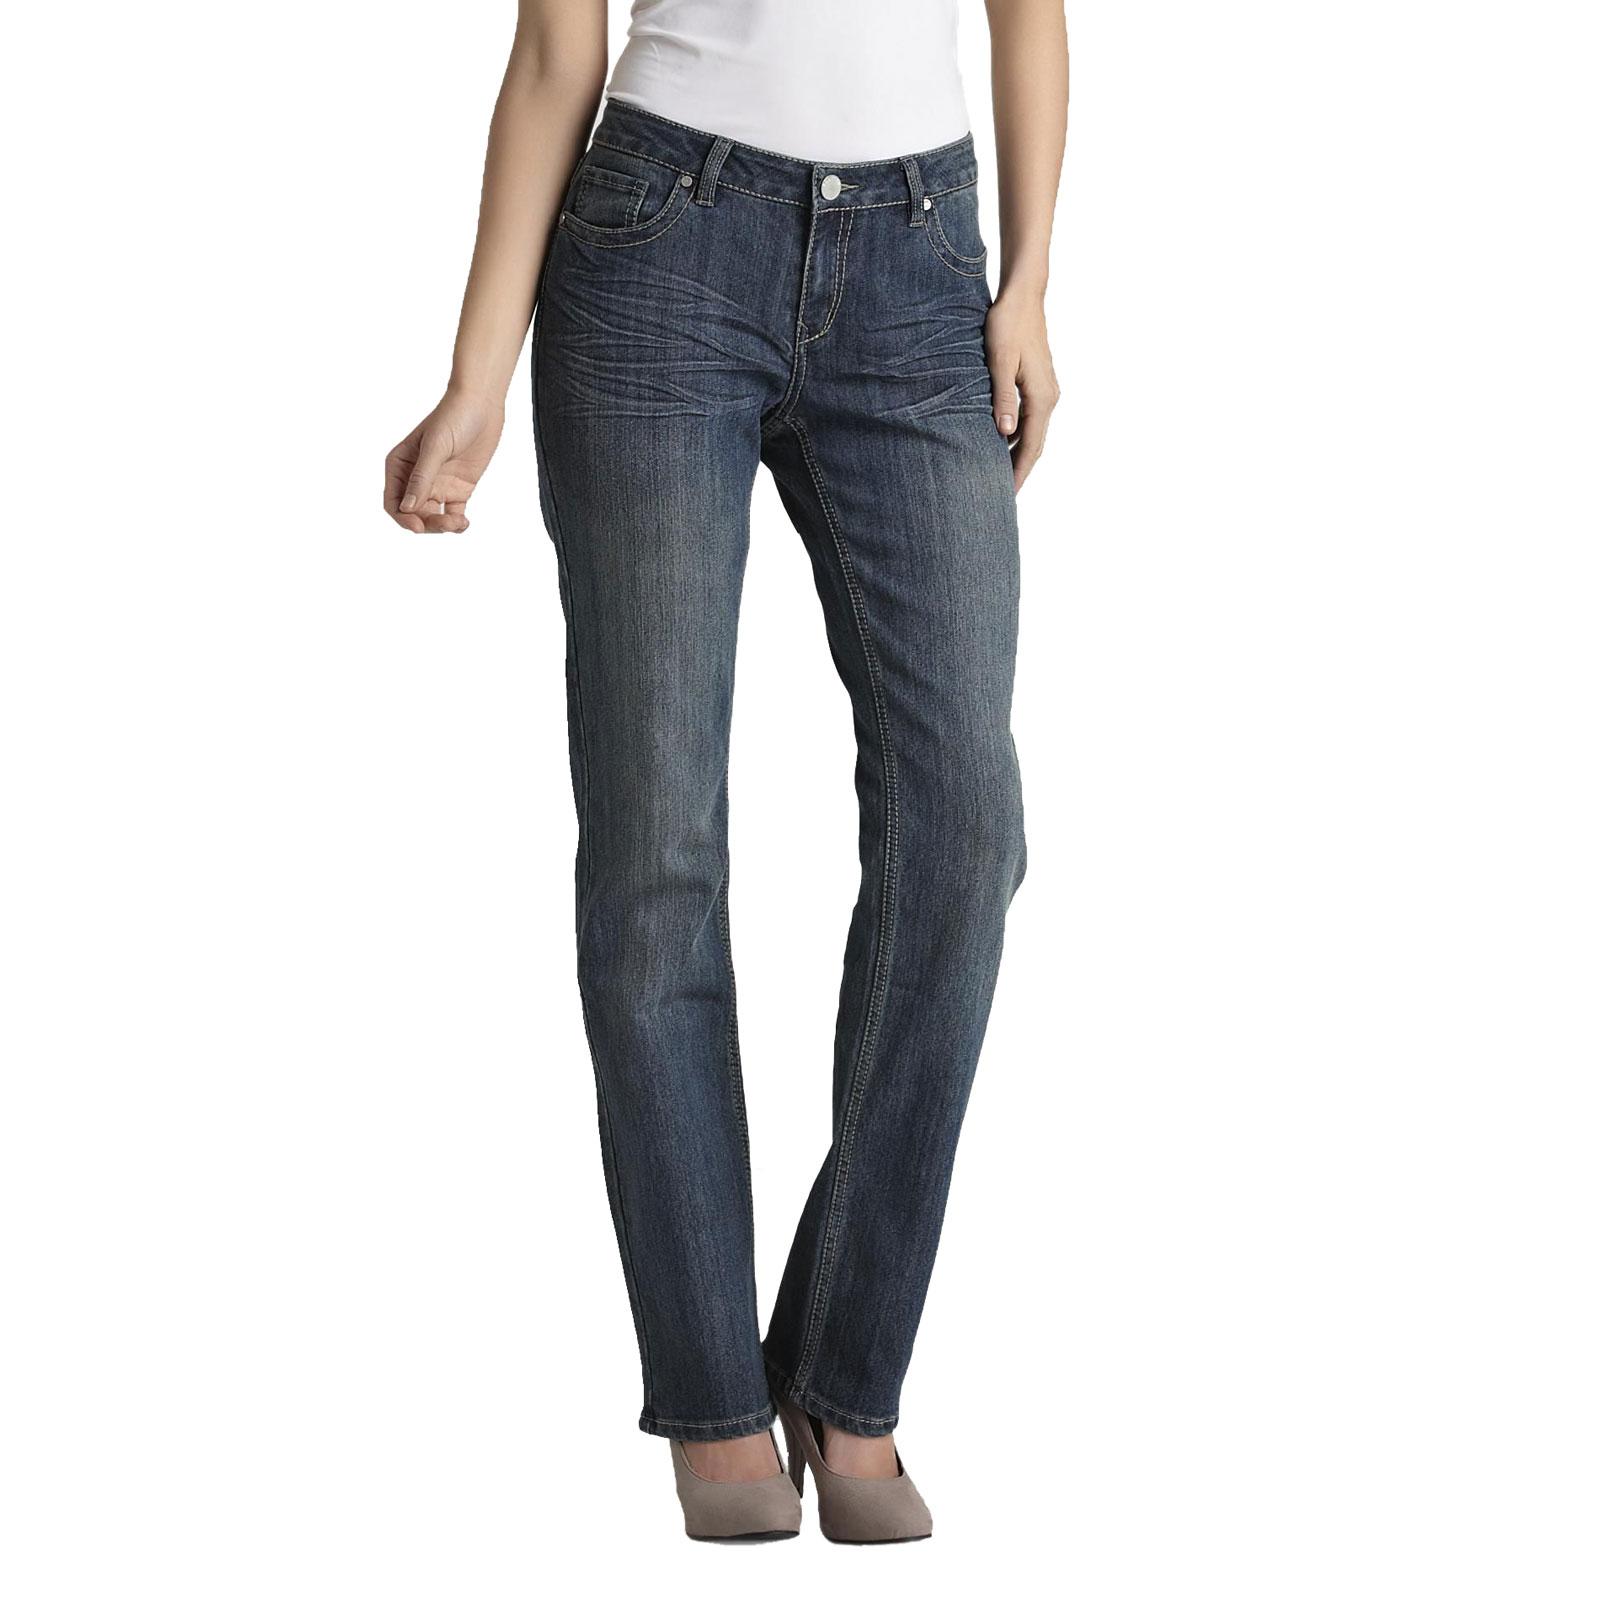 Route 66 Women's Straight Leg Jeans